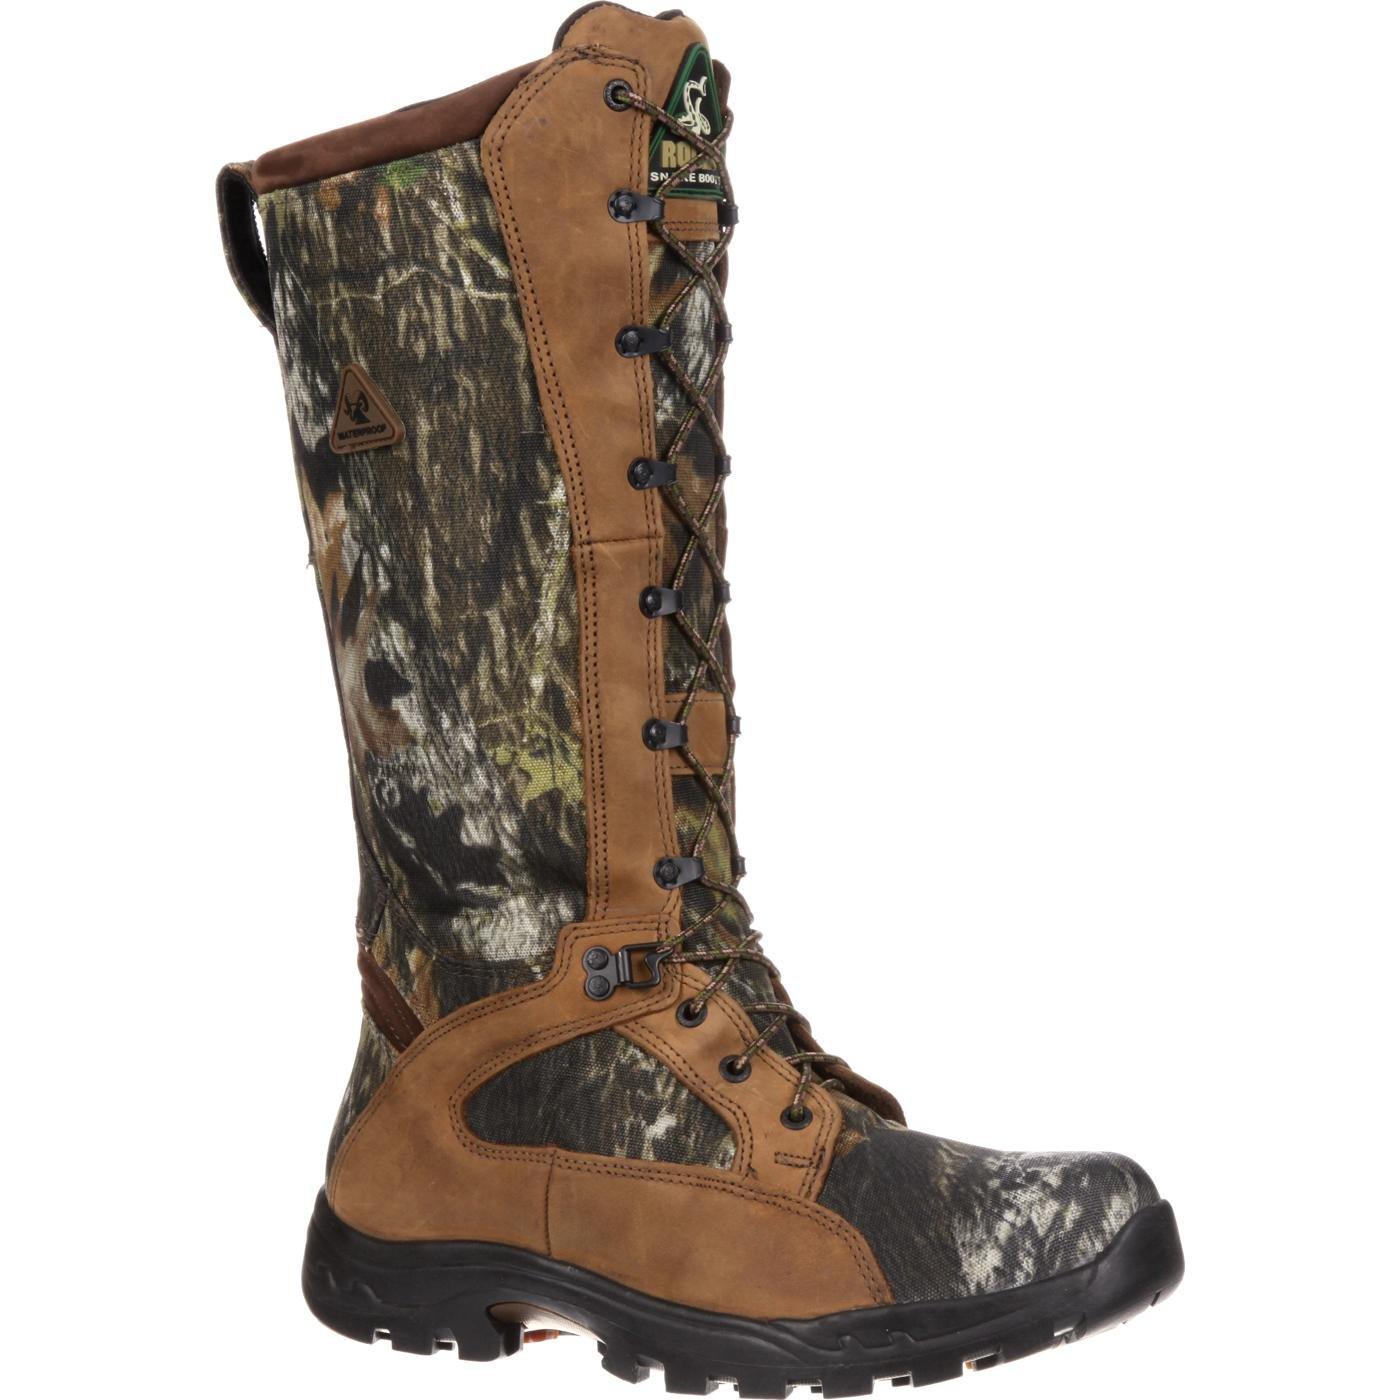 Rocky Men's Waterproof Snakeproof Hunting Boot Knee High, Mossy Oak Breakup, 8.5 M US